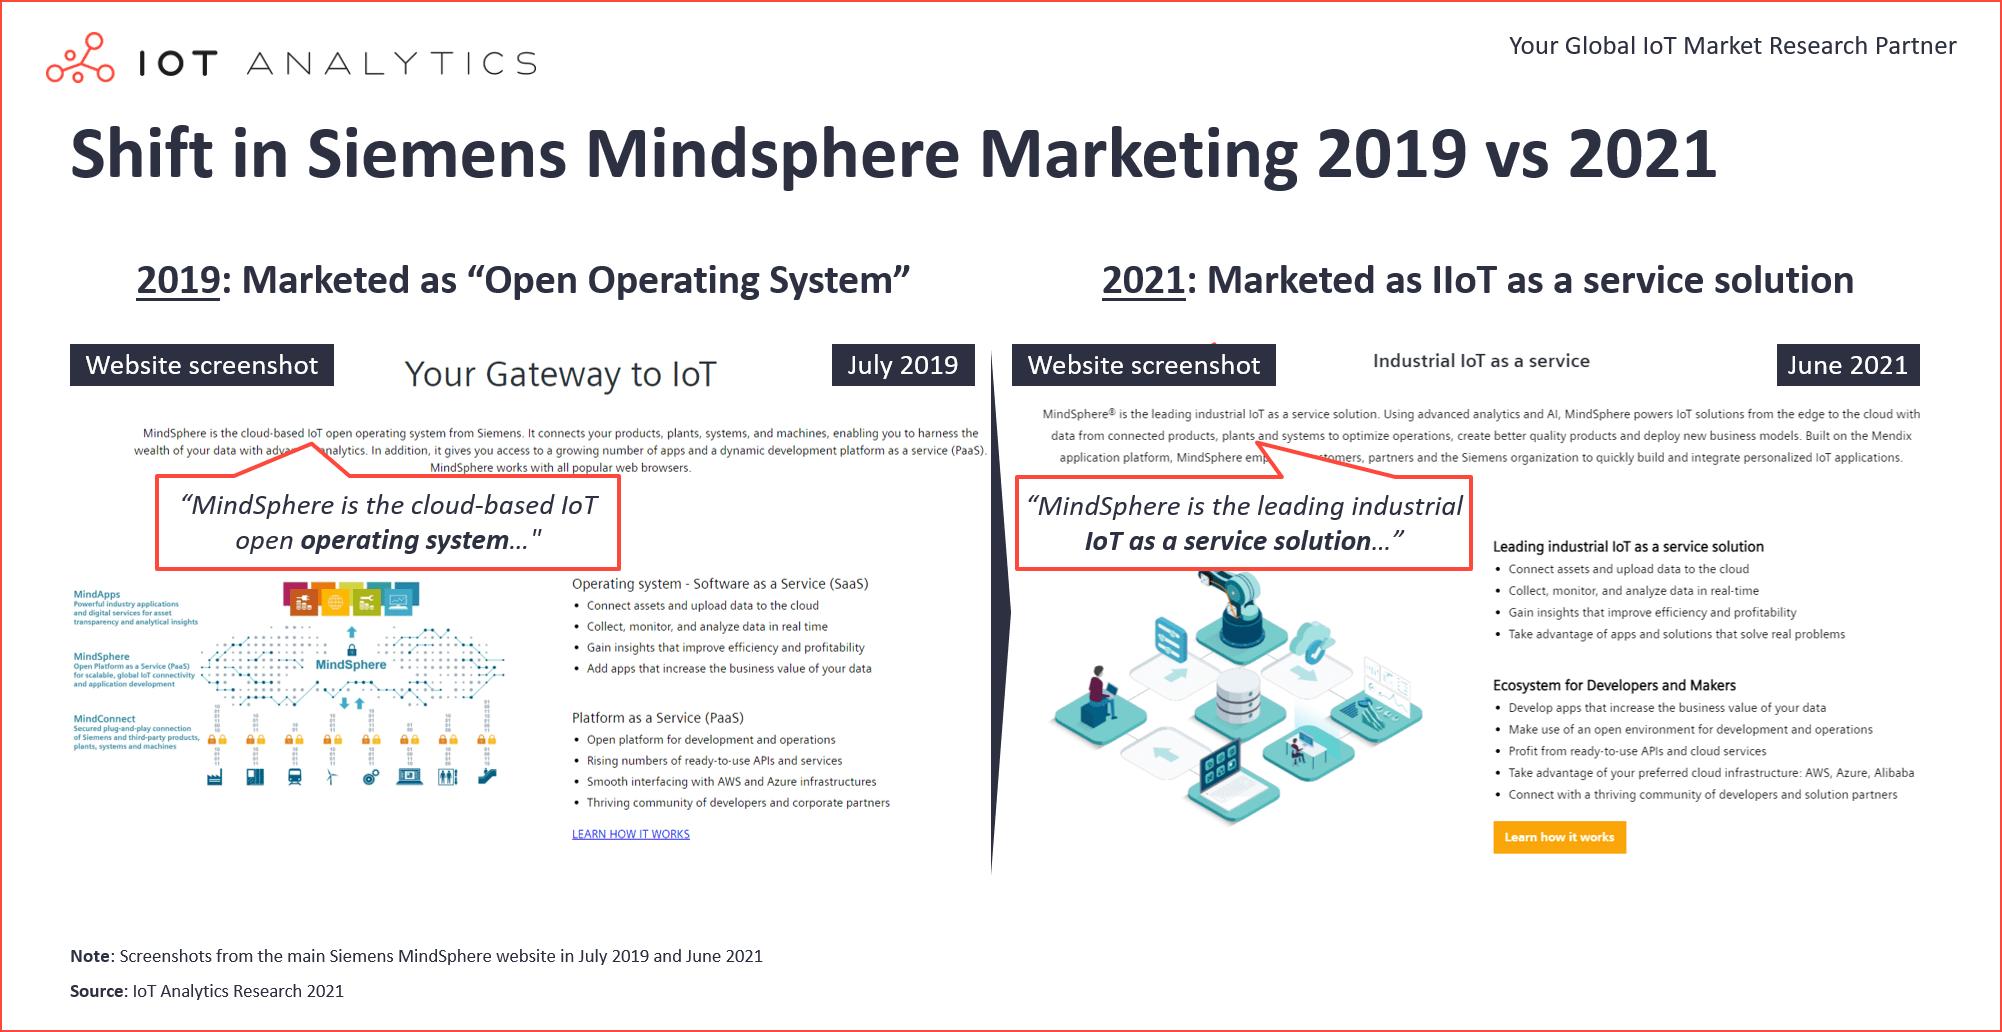 Shift in Siemens Mindsphere Marketing 2019 vs 2021